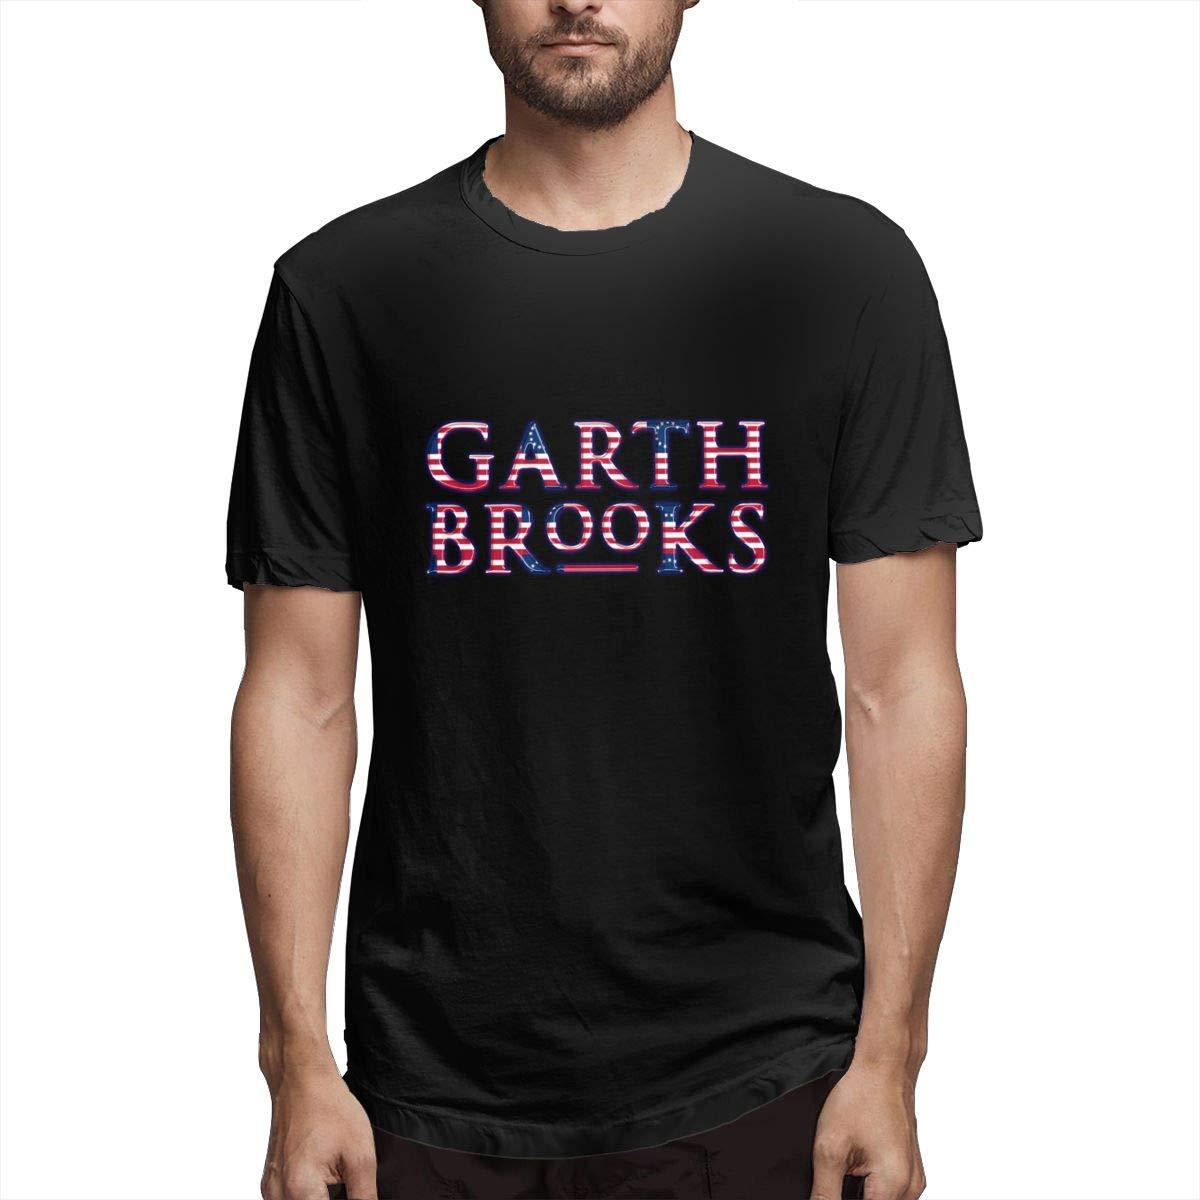 Lihehen Man Garth Brooks Logo Simple Casual Round Neck Tees Shirts